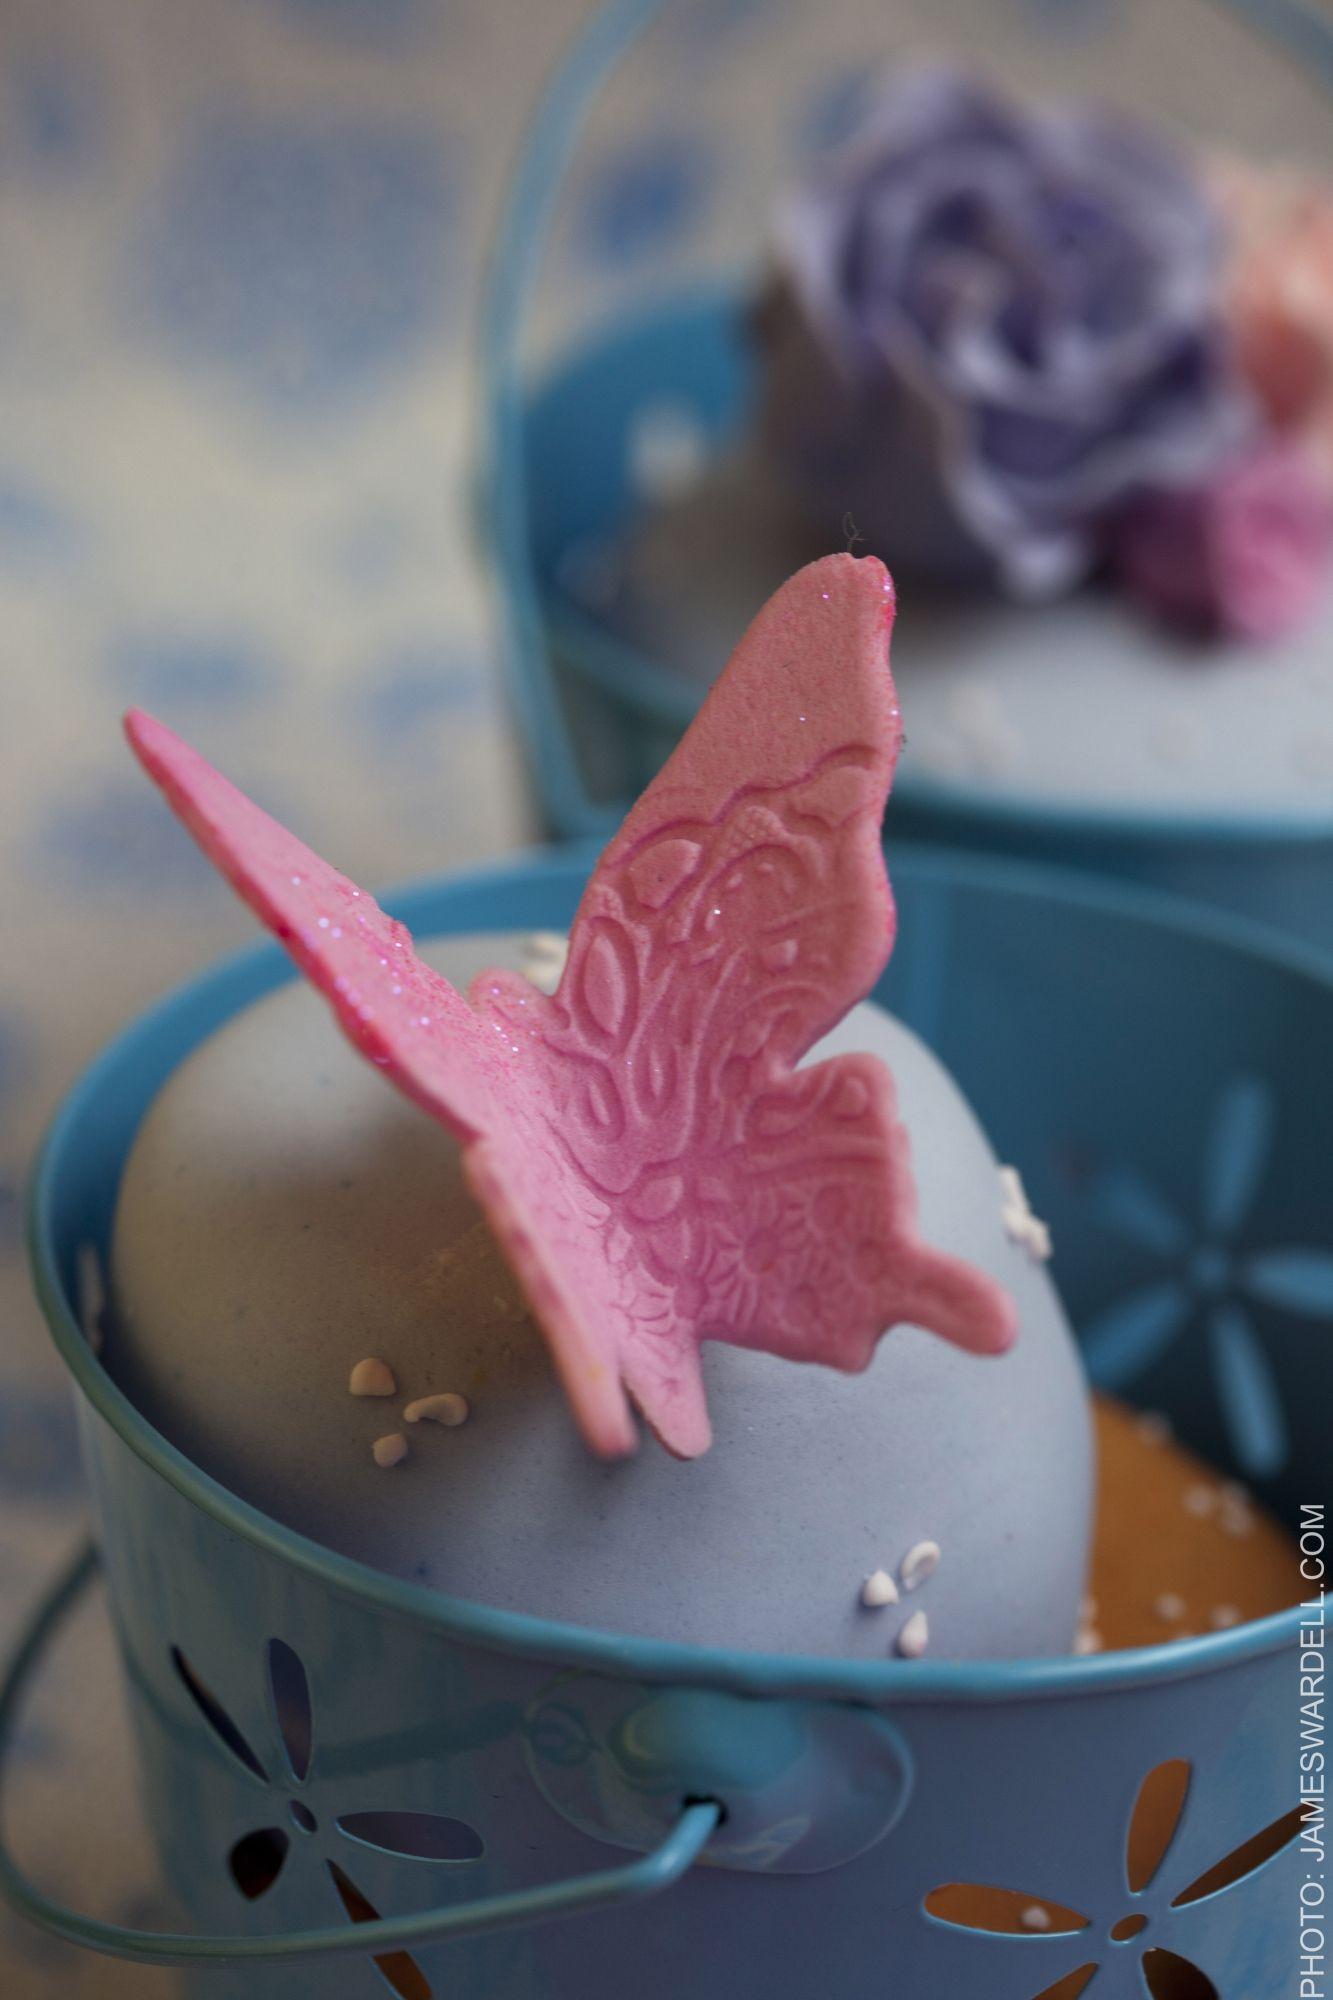 """Glam Pastry"" by... Anabelén Casalini. Perfectos como souvenir de tu Boda al Aire Libre.. ,"